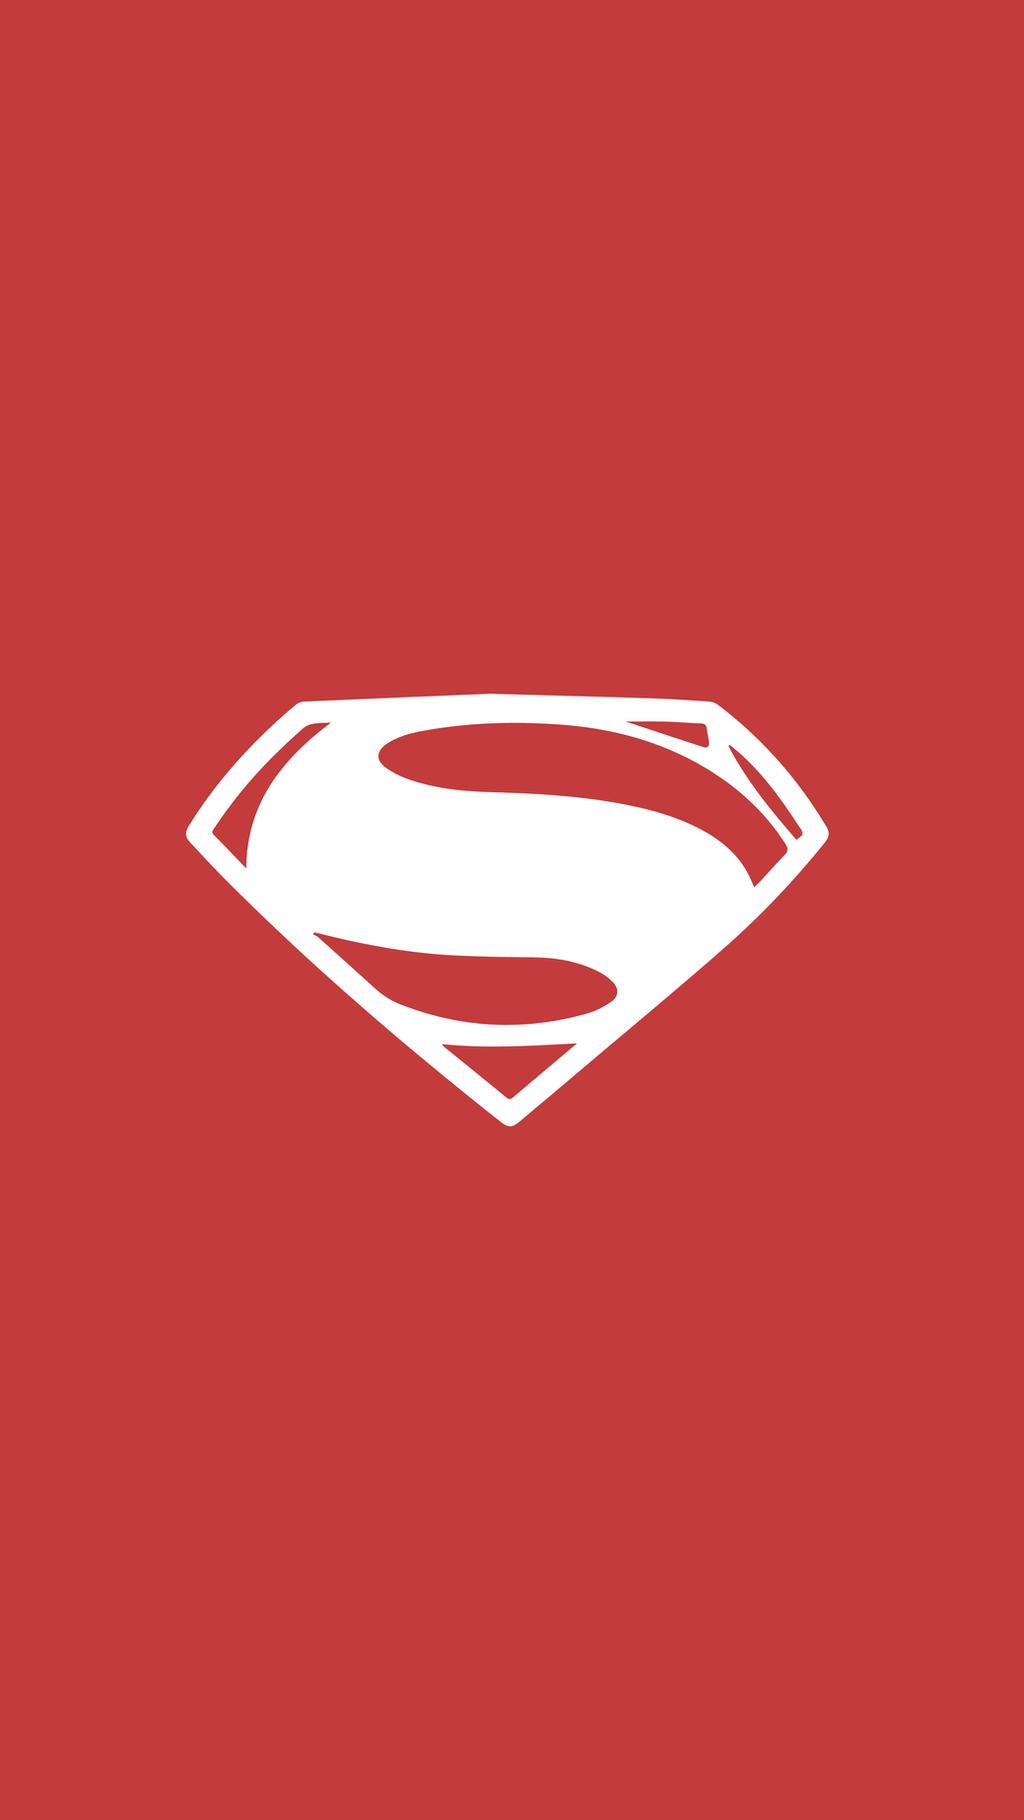 Best Wallpaper Mobile Superhero - justice_league_superman_wallpaper_mobile_by_darkfailure-da38d38  Trends_924983.jpg